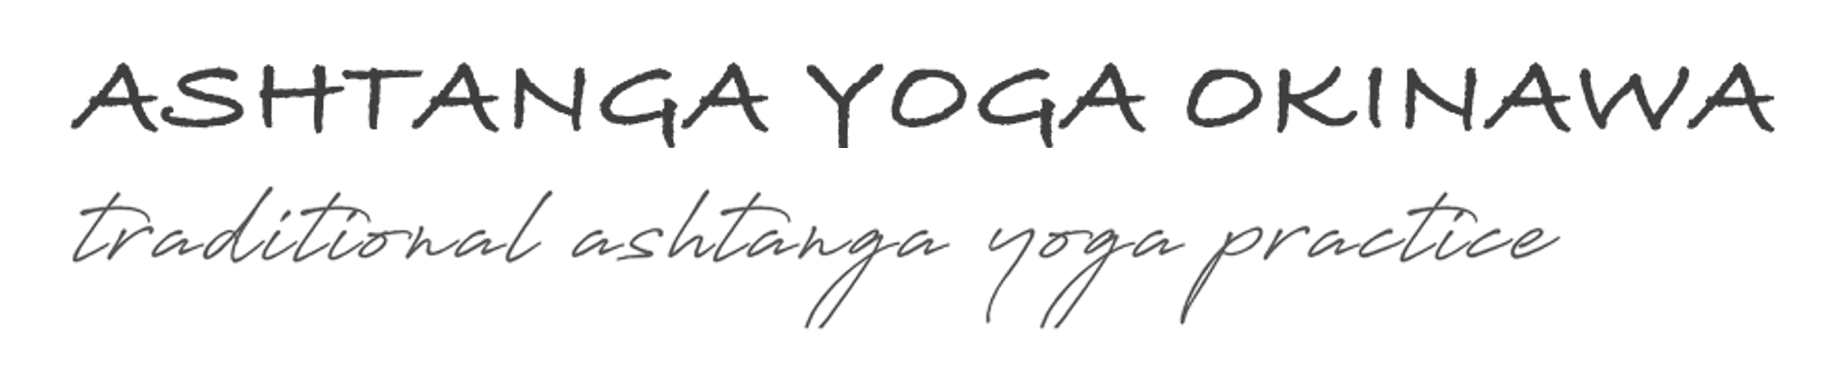 ashtanga yoga okinawa | logo